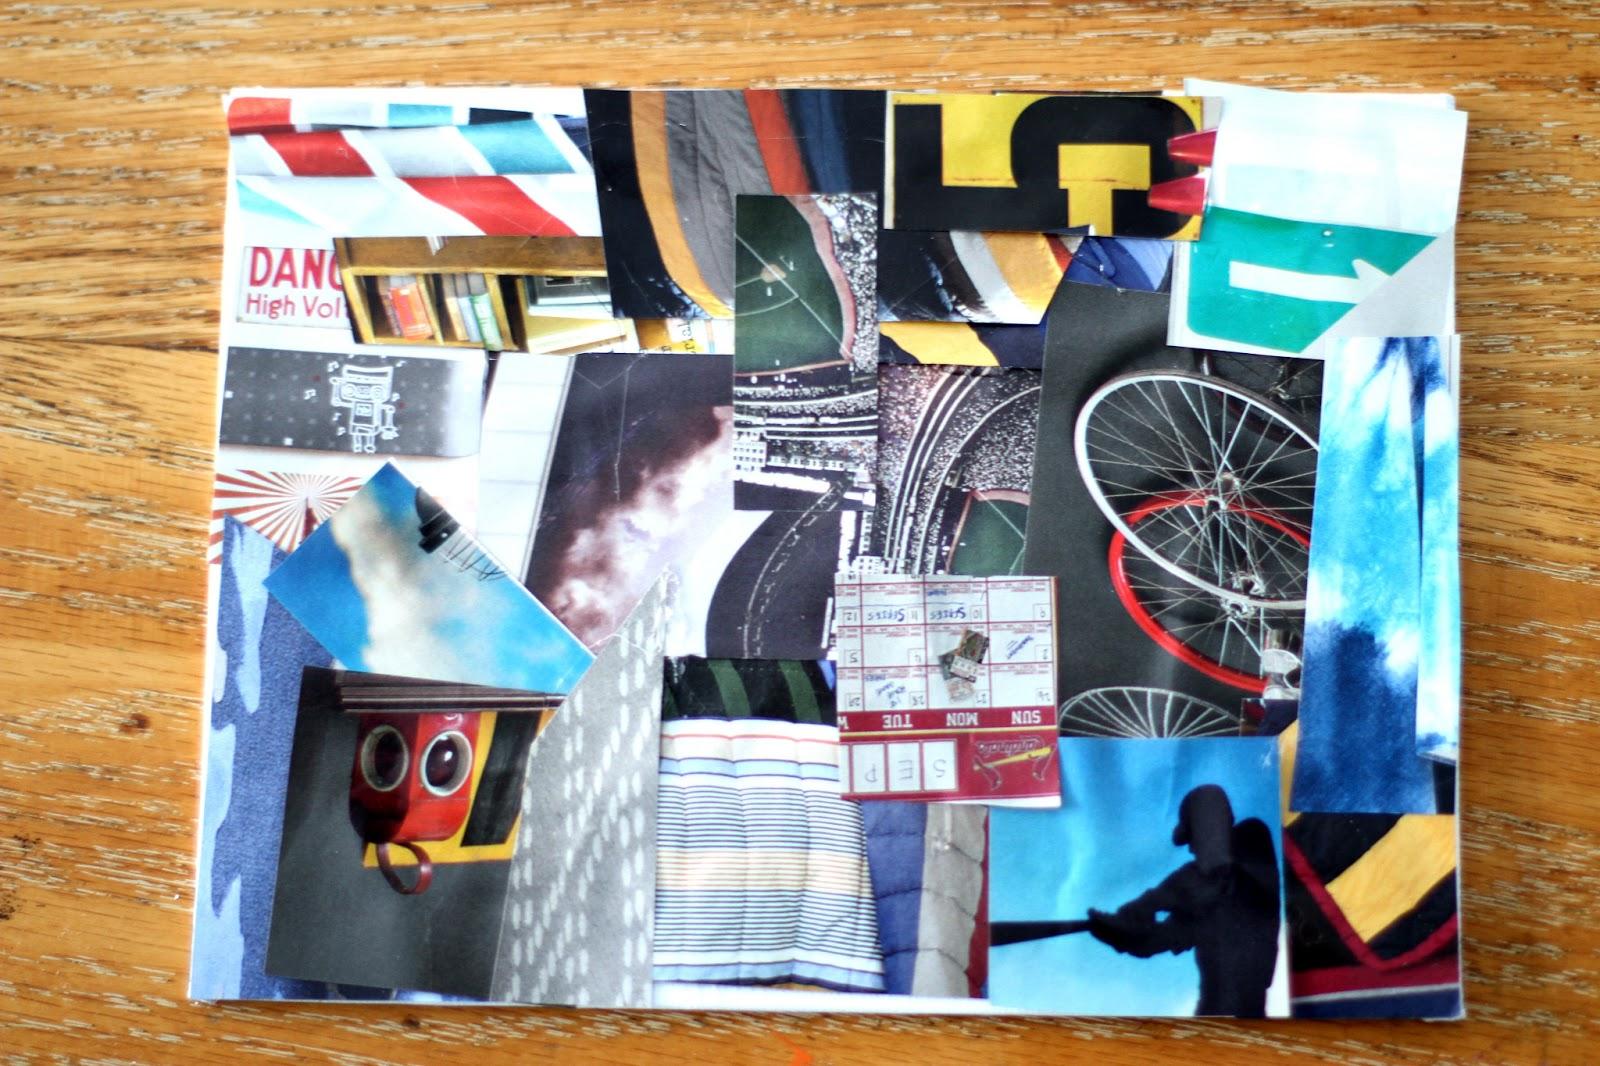 Fußboden Vinyl Test ~ Shannan martin writes diy vinyl letter art your addiction